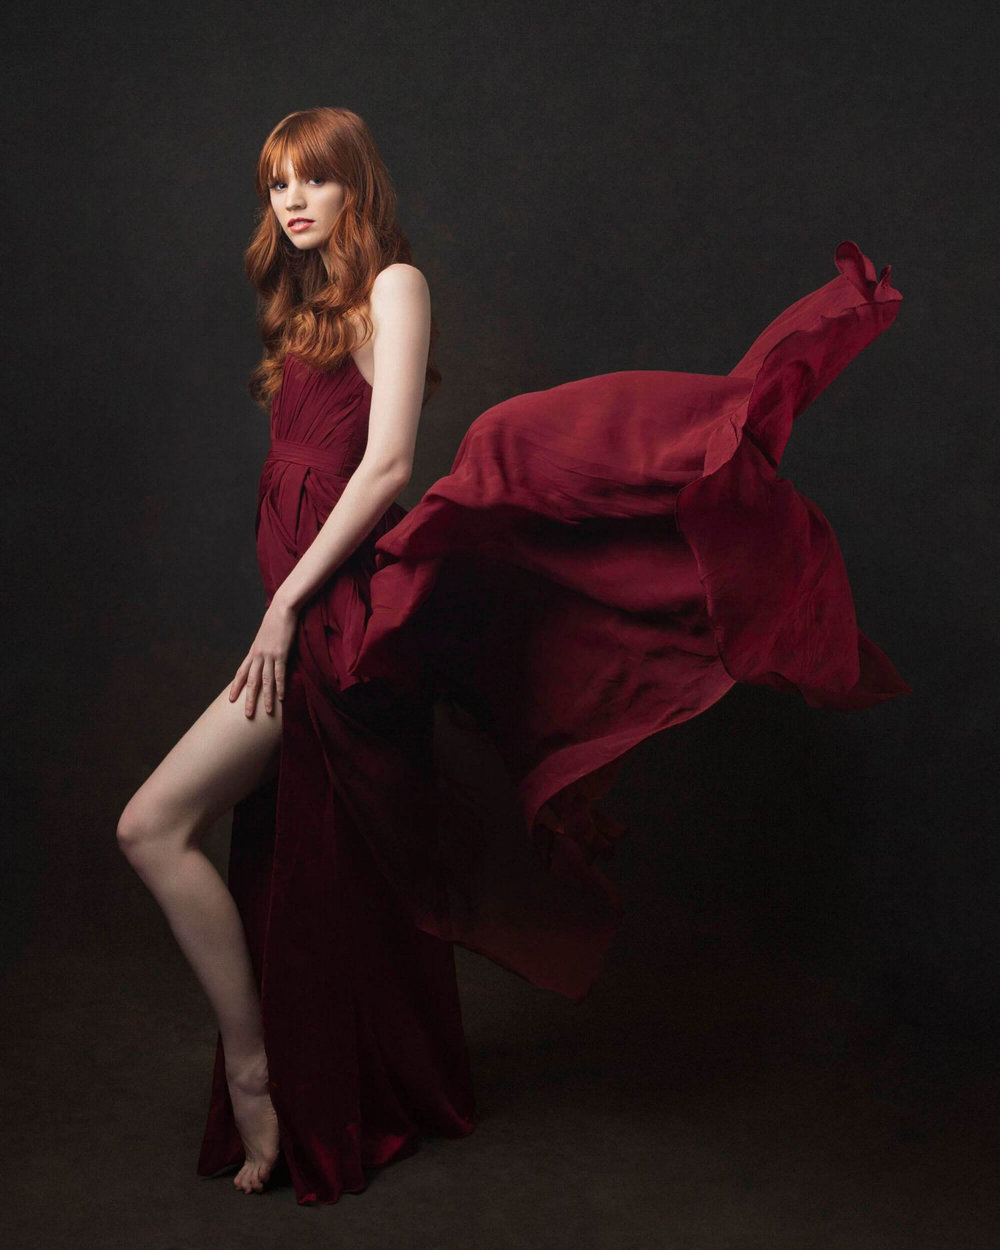 Red-dress glamour portrait photography Starnberg